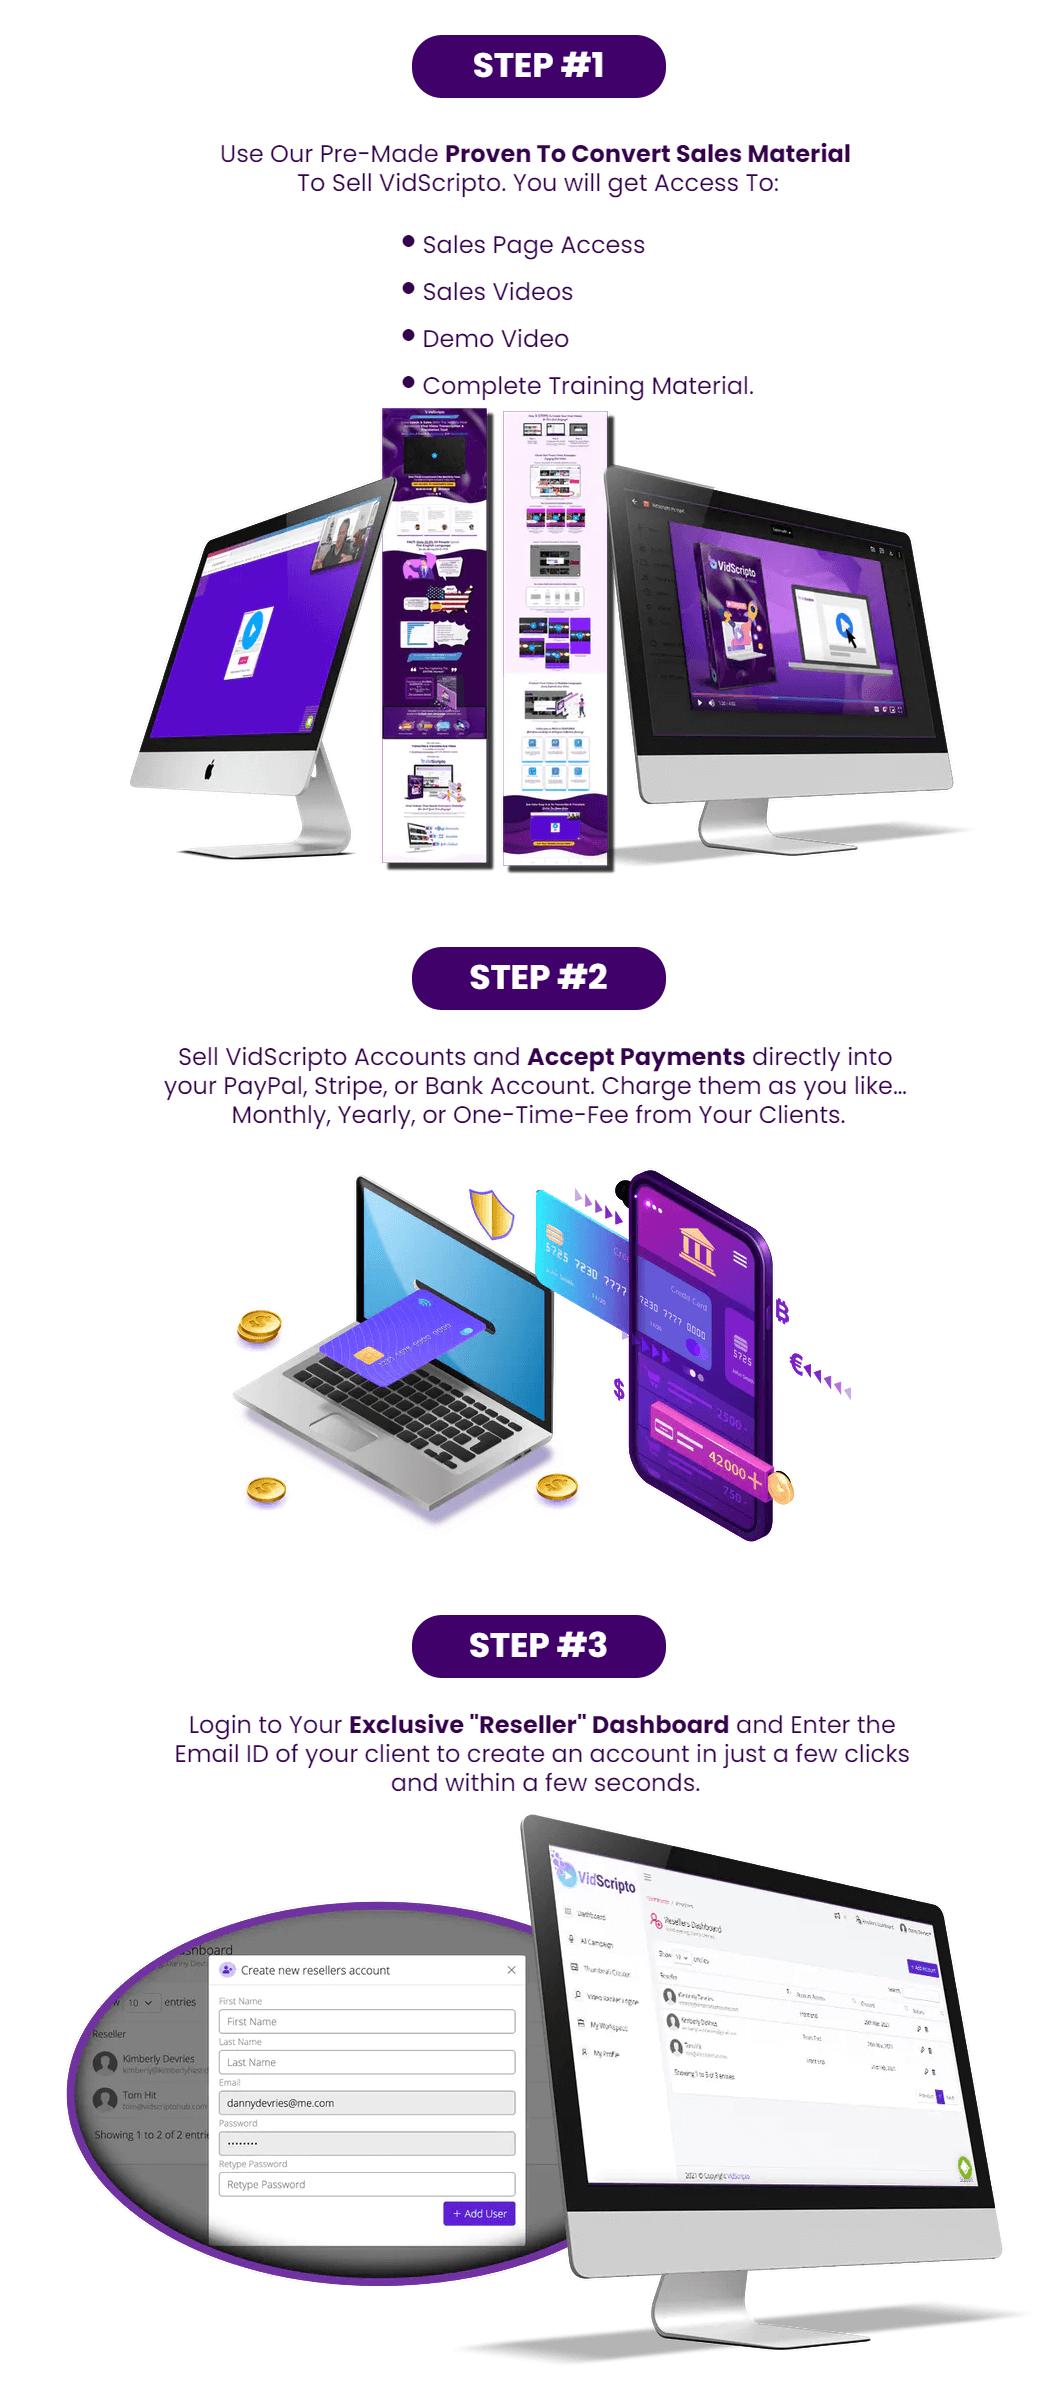 Vidscripto-OTO-4-steps-to-launch-a-software-business